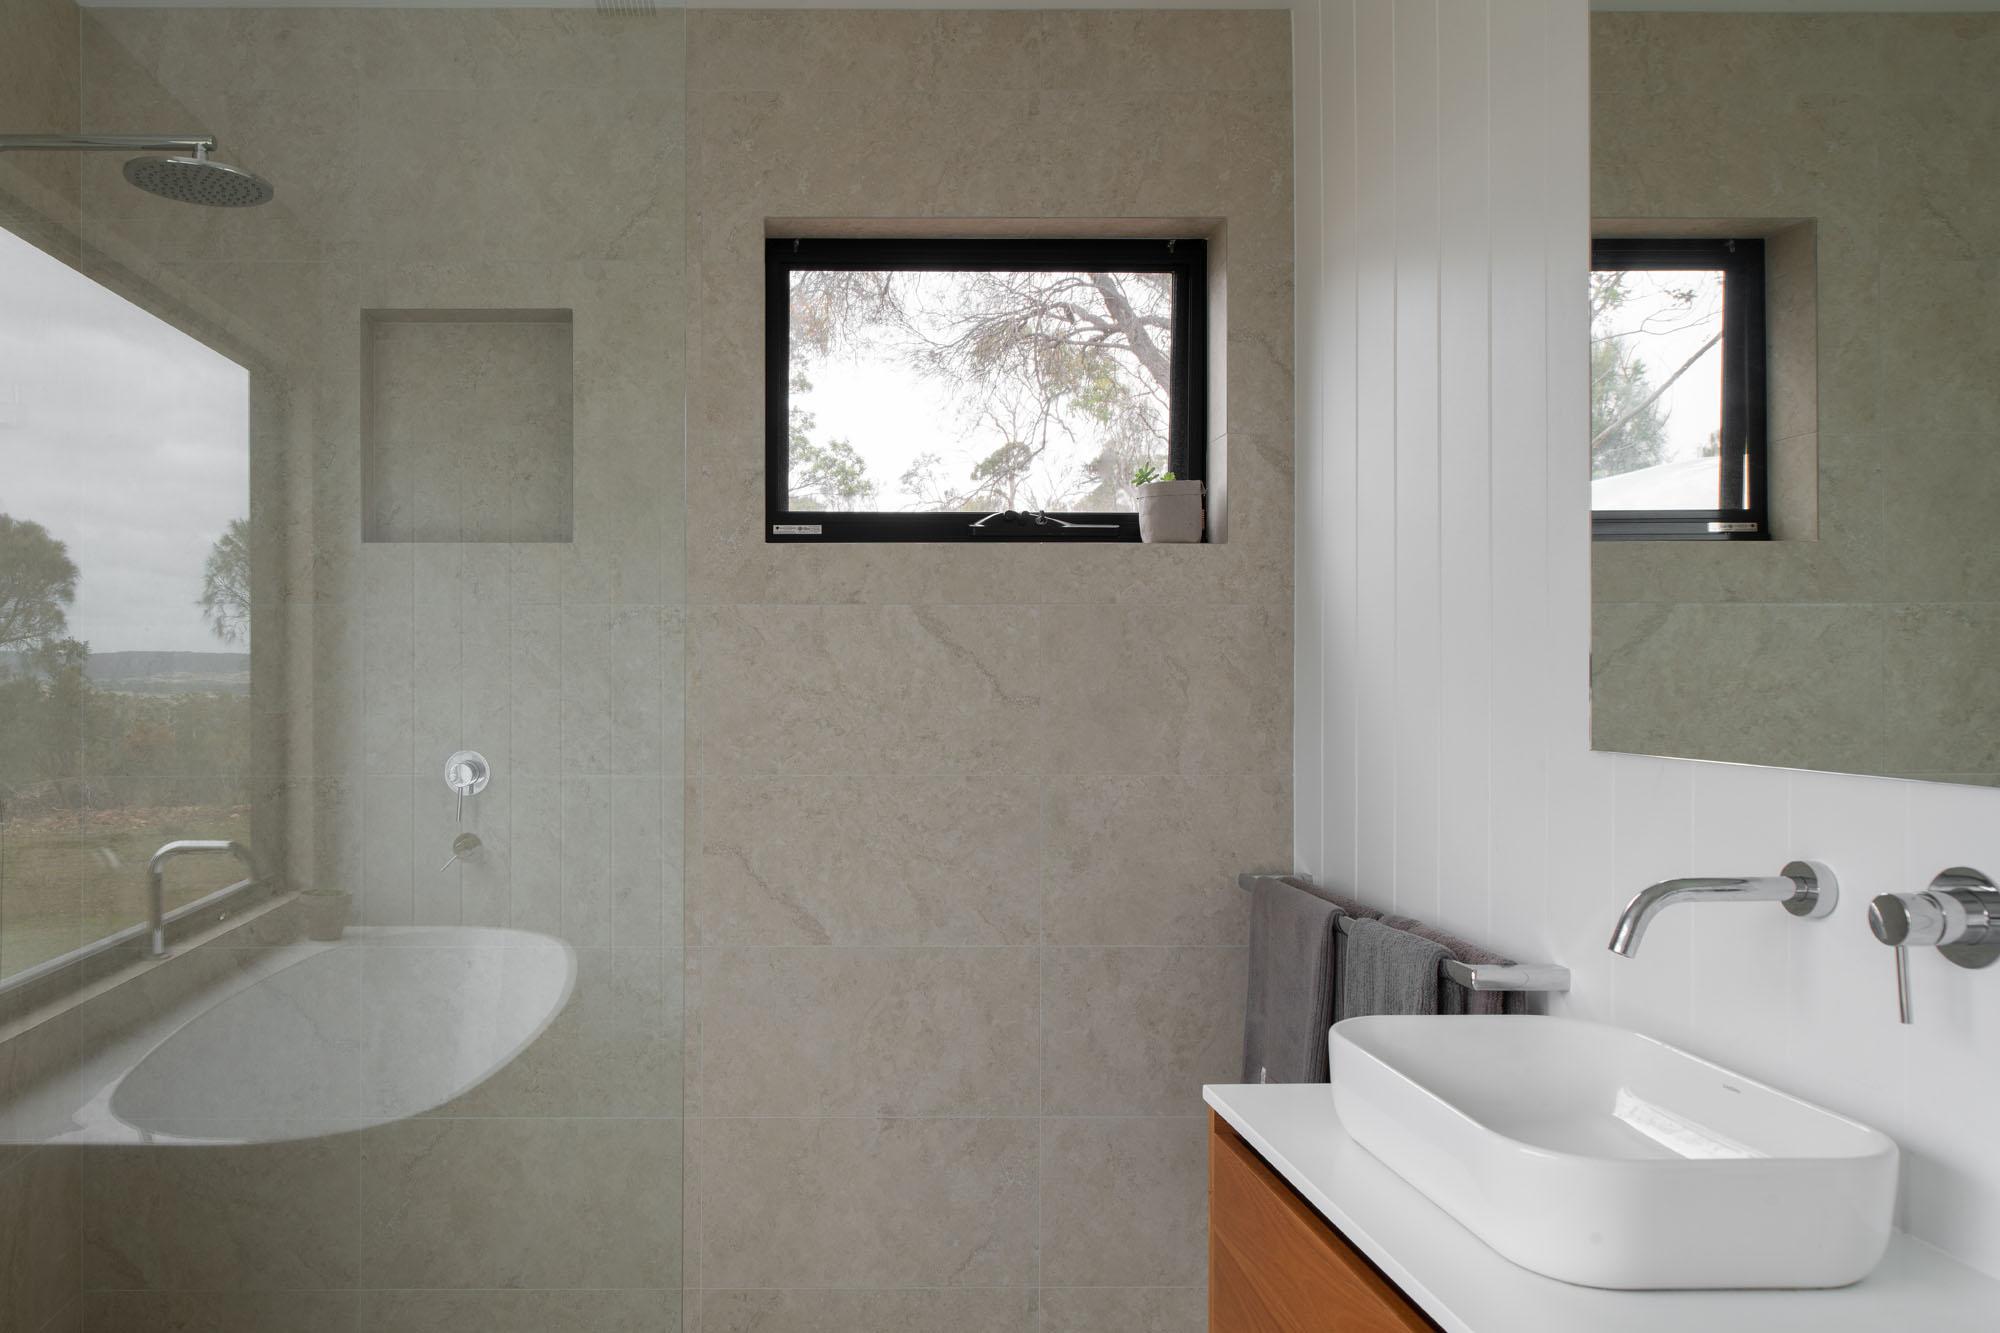 Bathroom vanity and shower in off-grid home